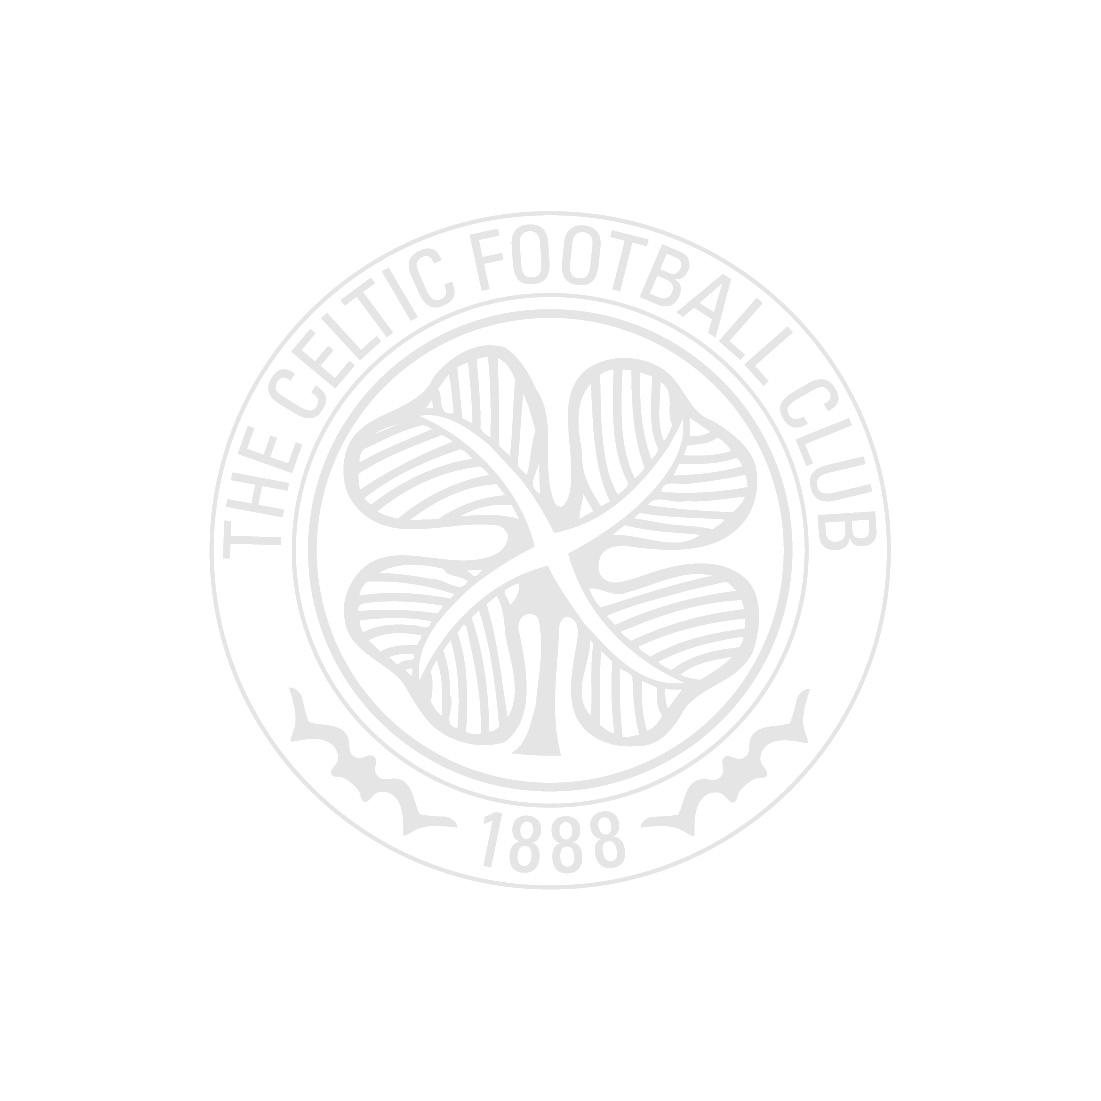 Celtic Mens Away Shirt 18/19 with Sponsor Back